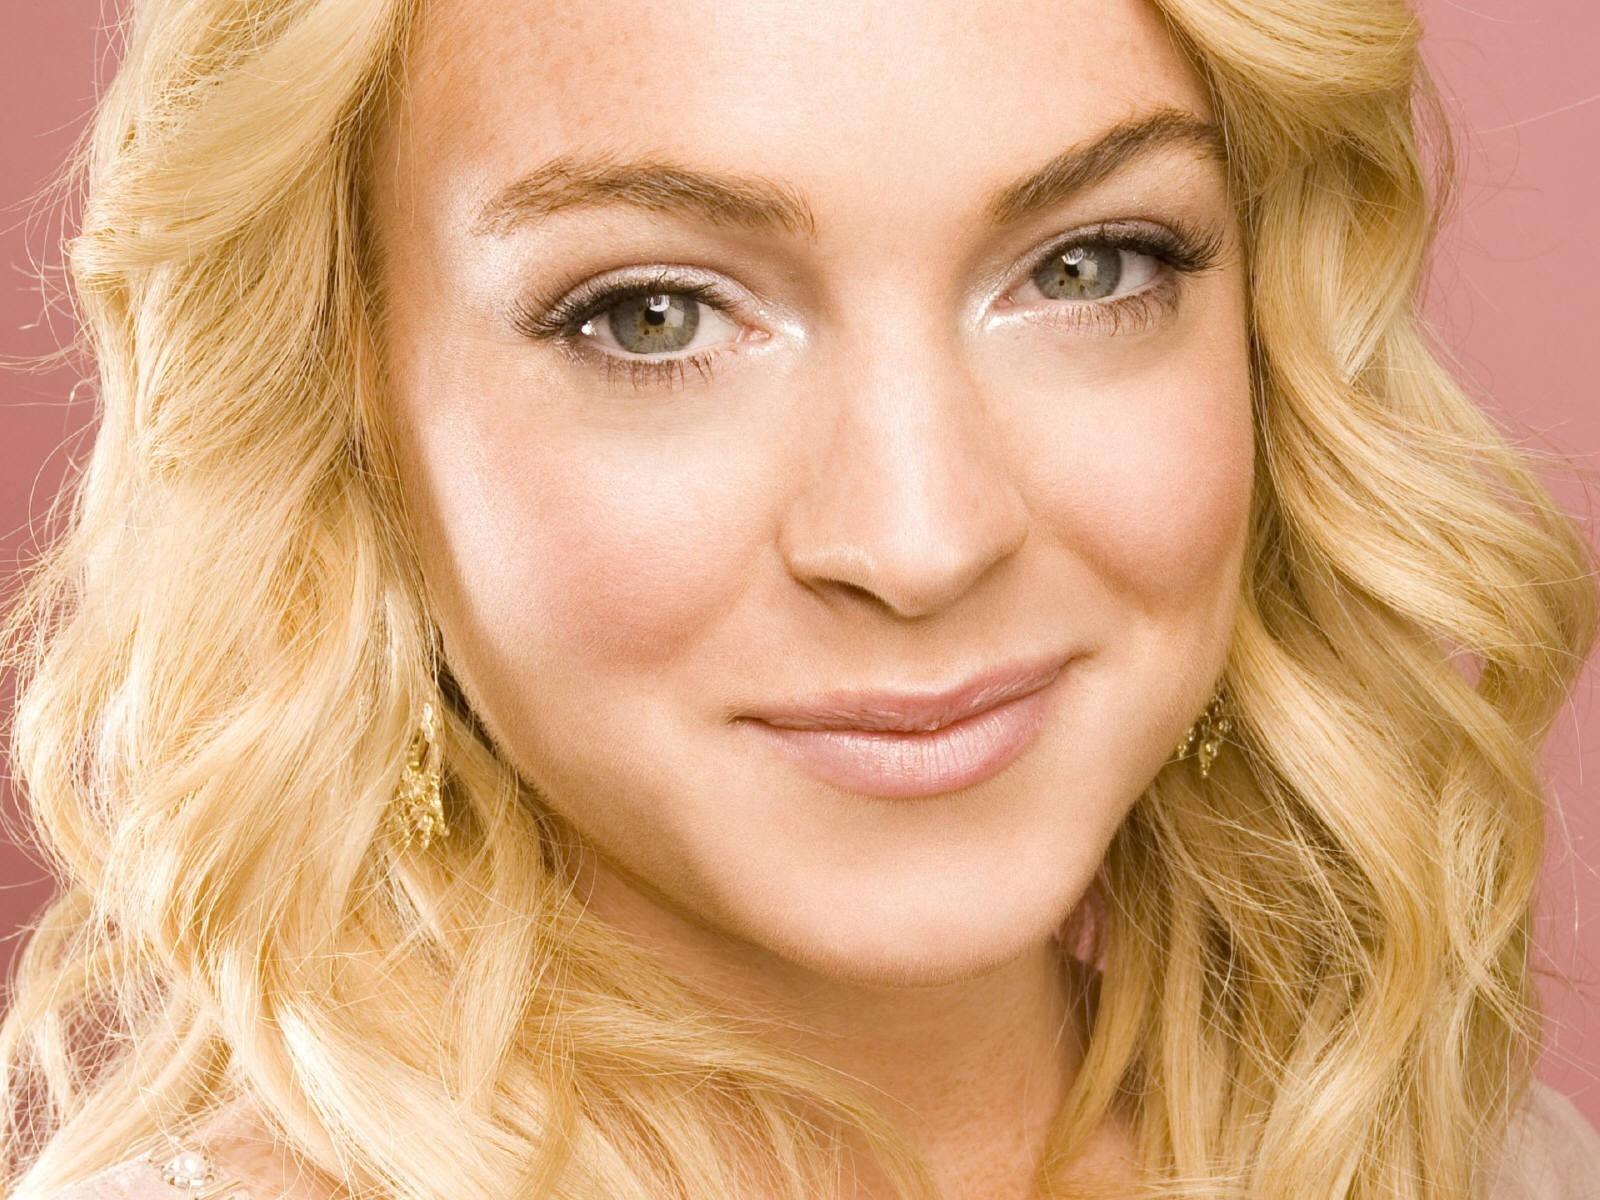 Wallpaper dell'attrice Lindsay Lohan